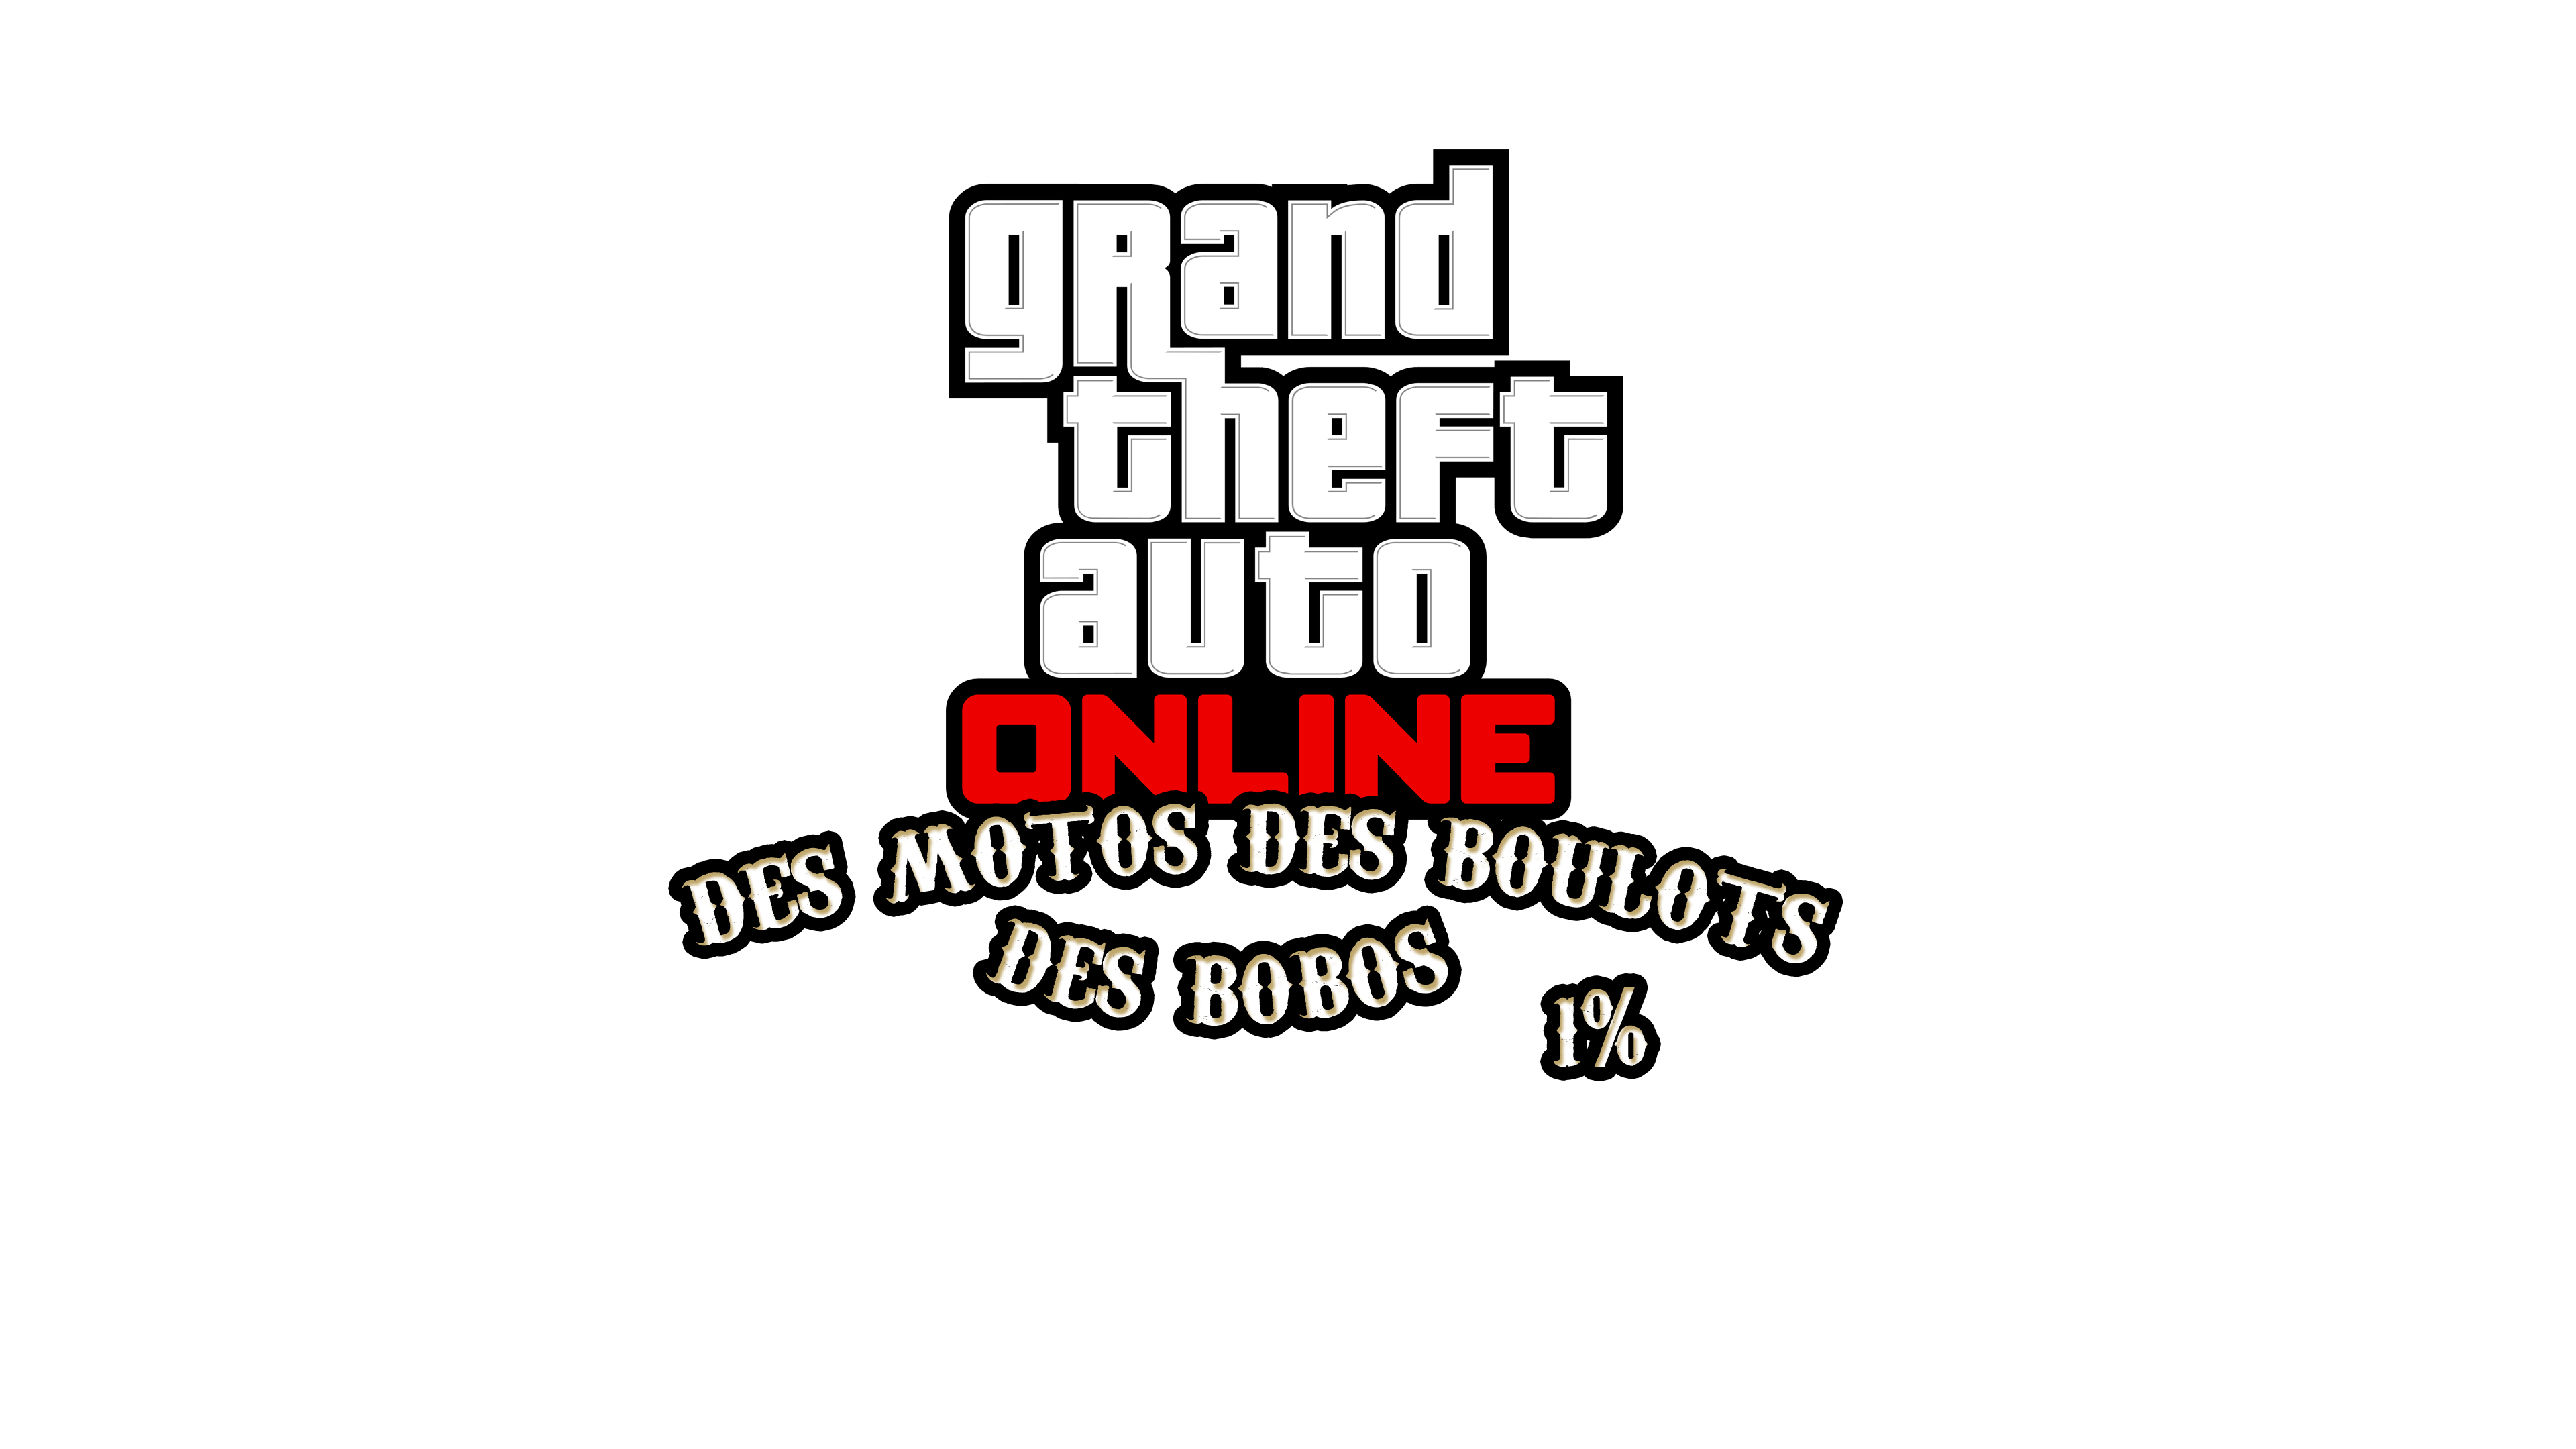 GTA Online Motos, Boulots, Bobos